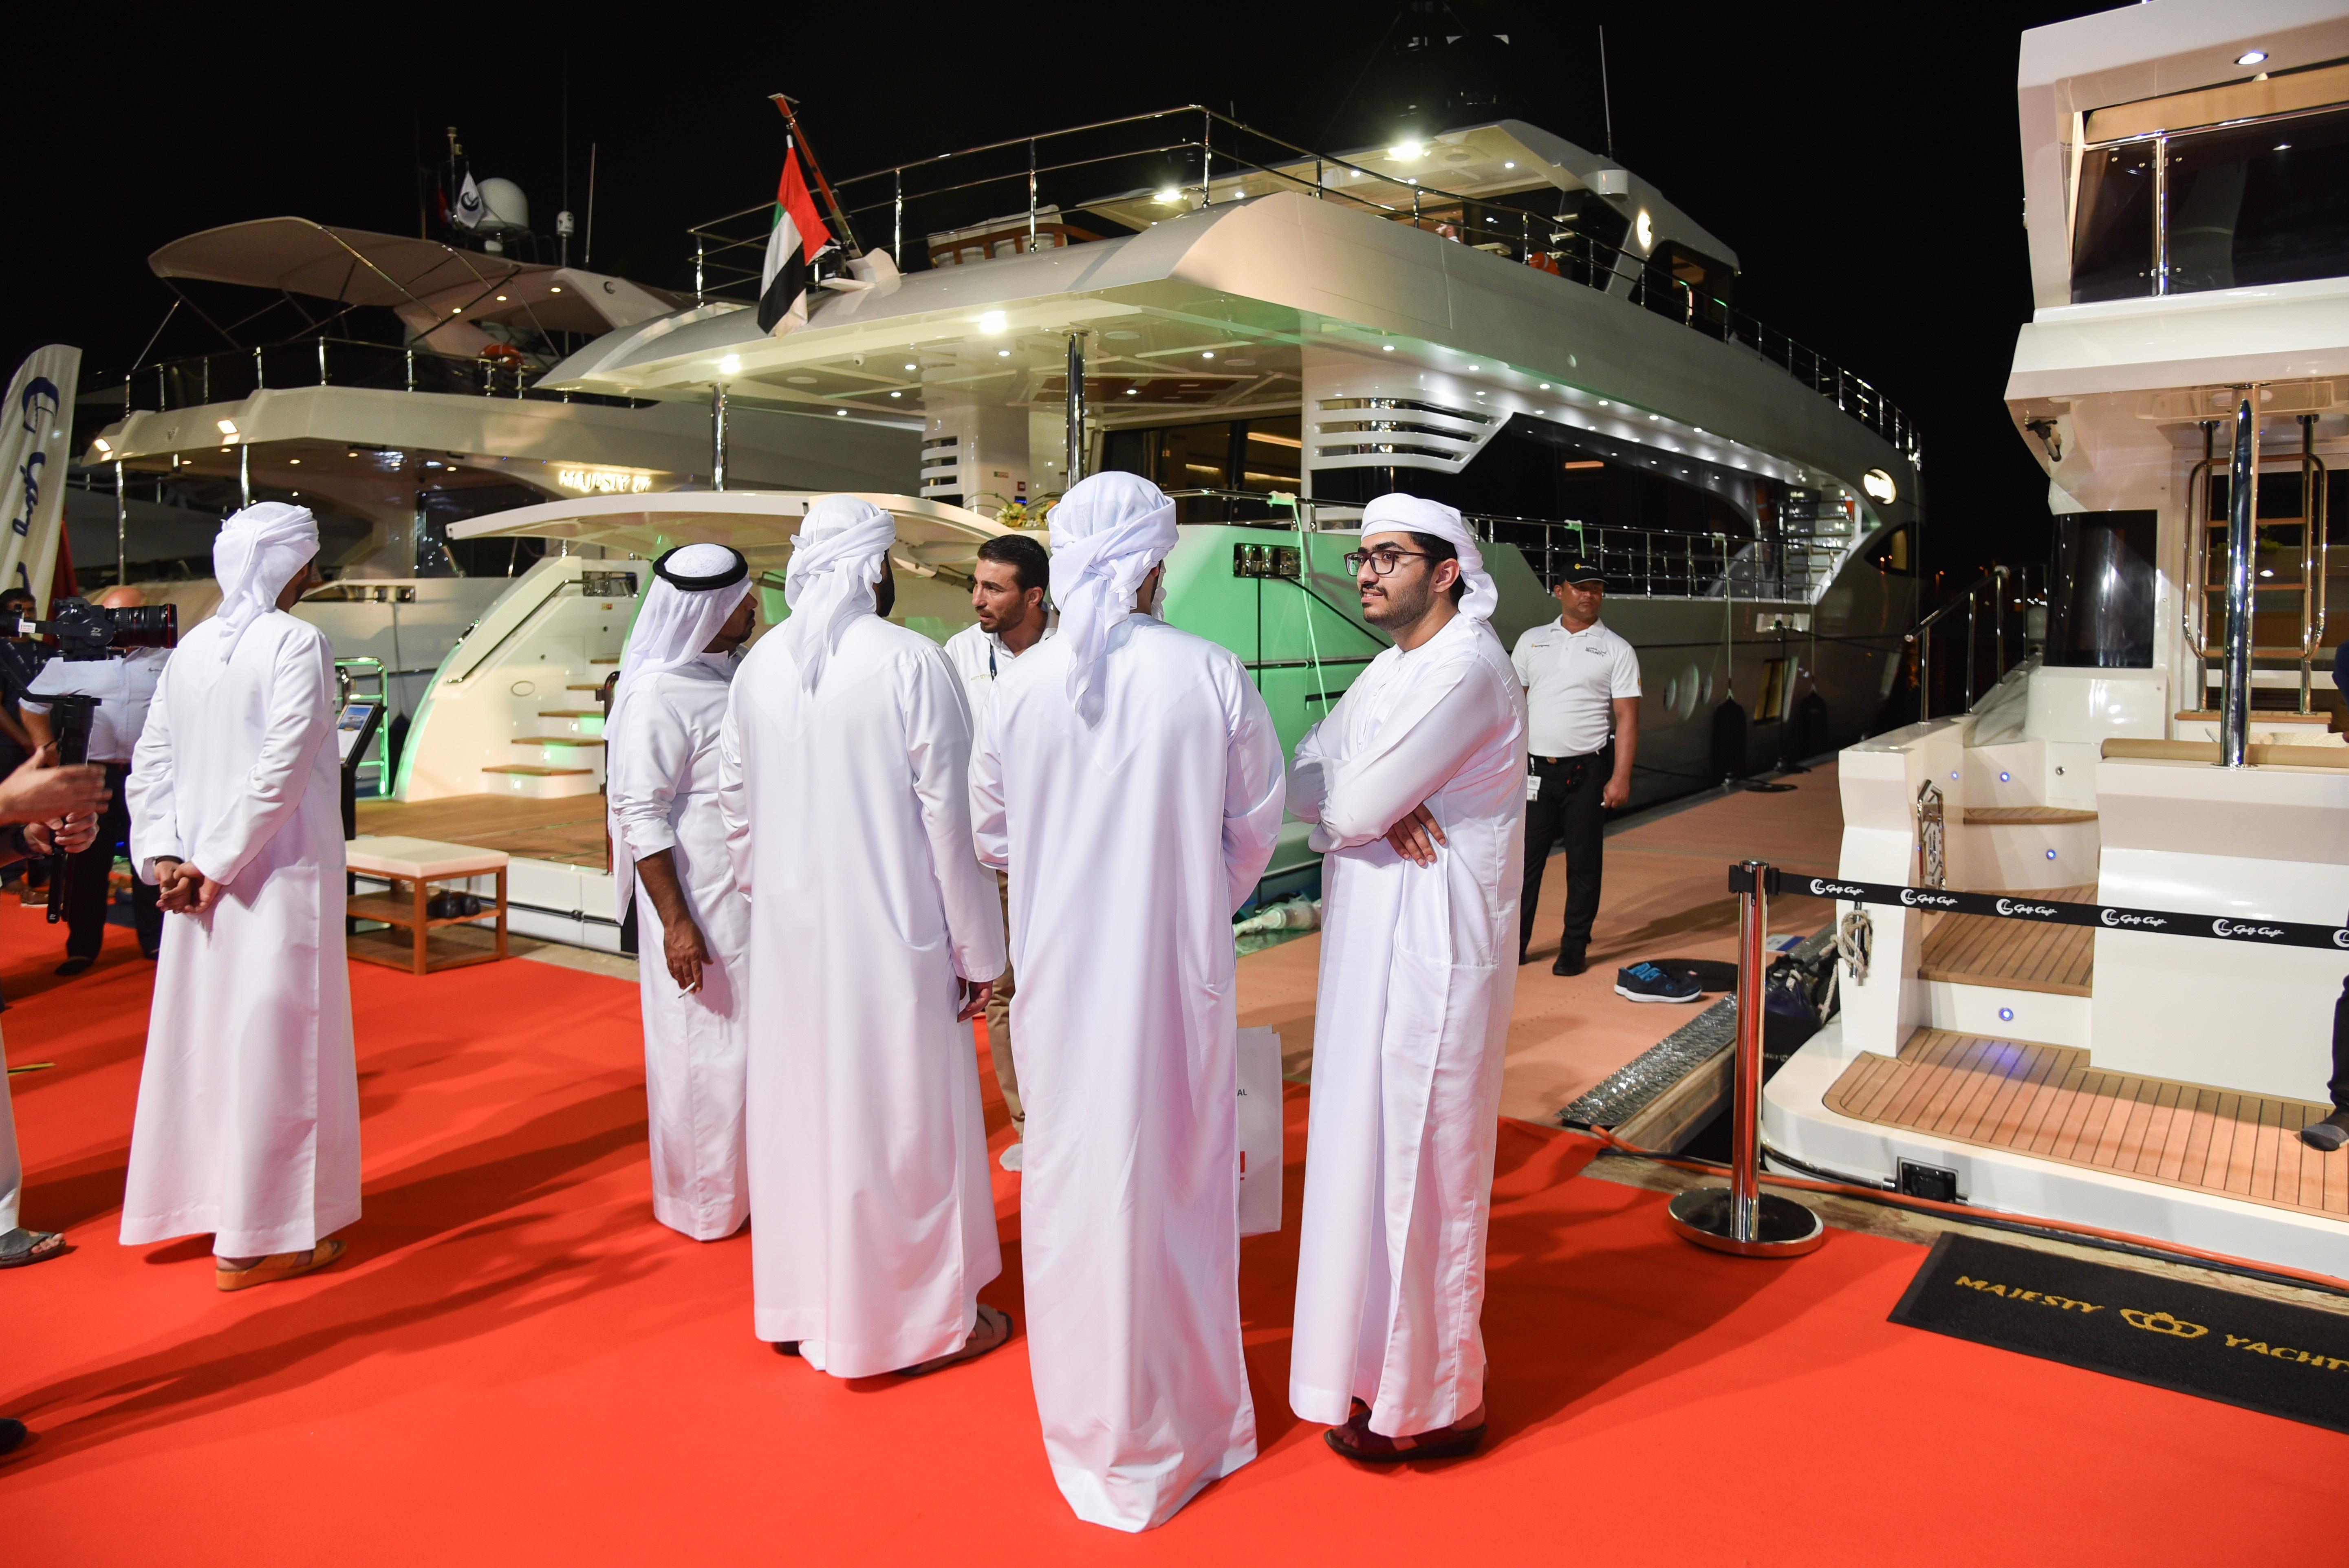 Gulf Craft at Abu Dhabi Boat Show 2018 Day 2(24).jpg